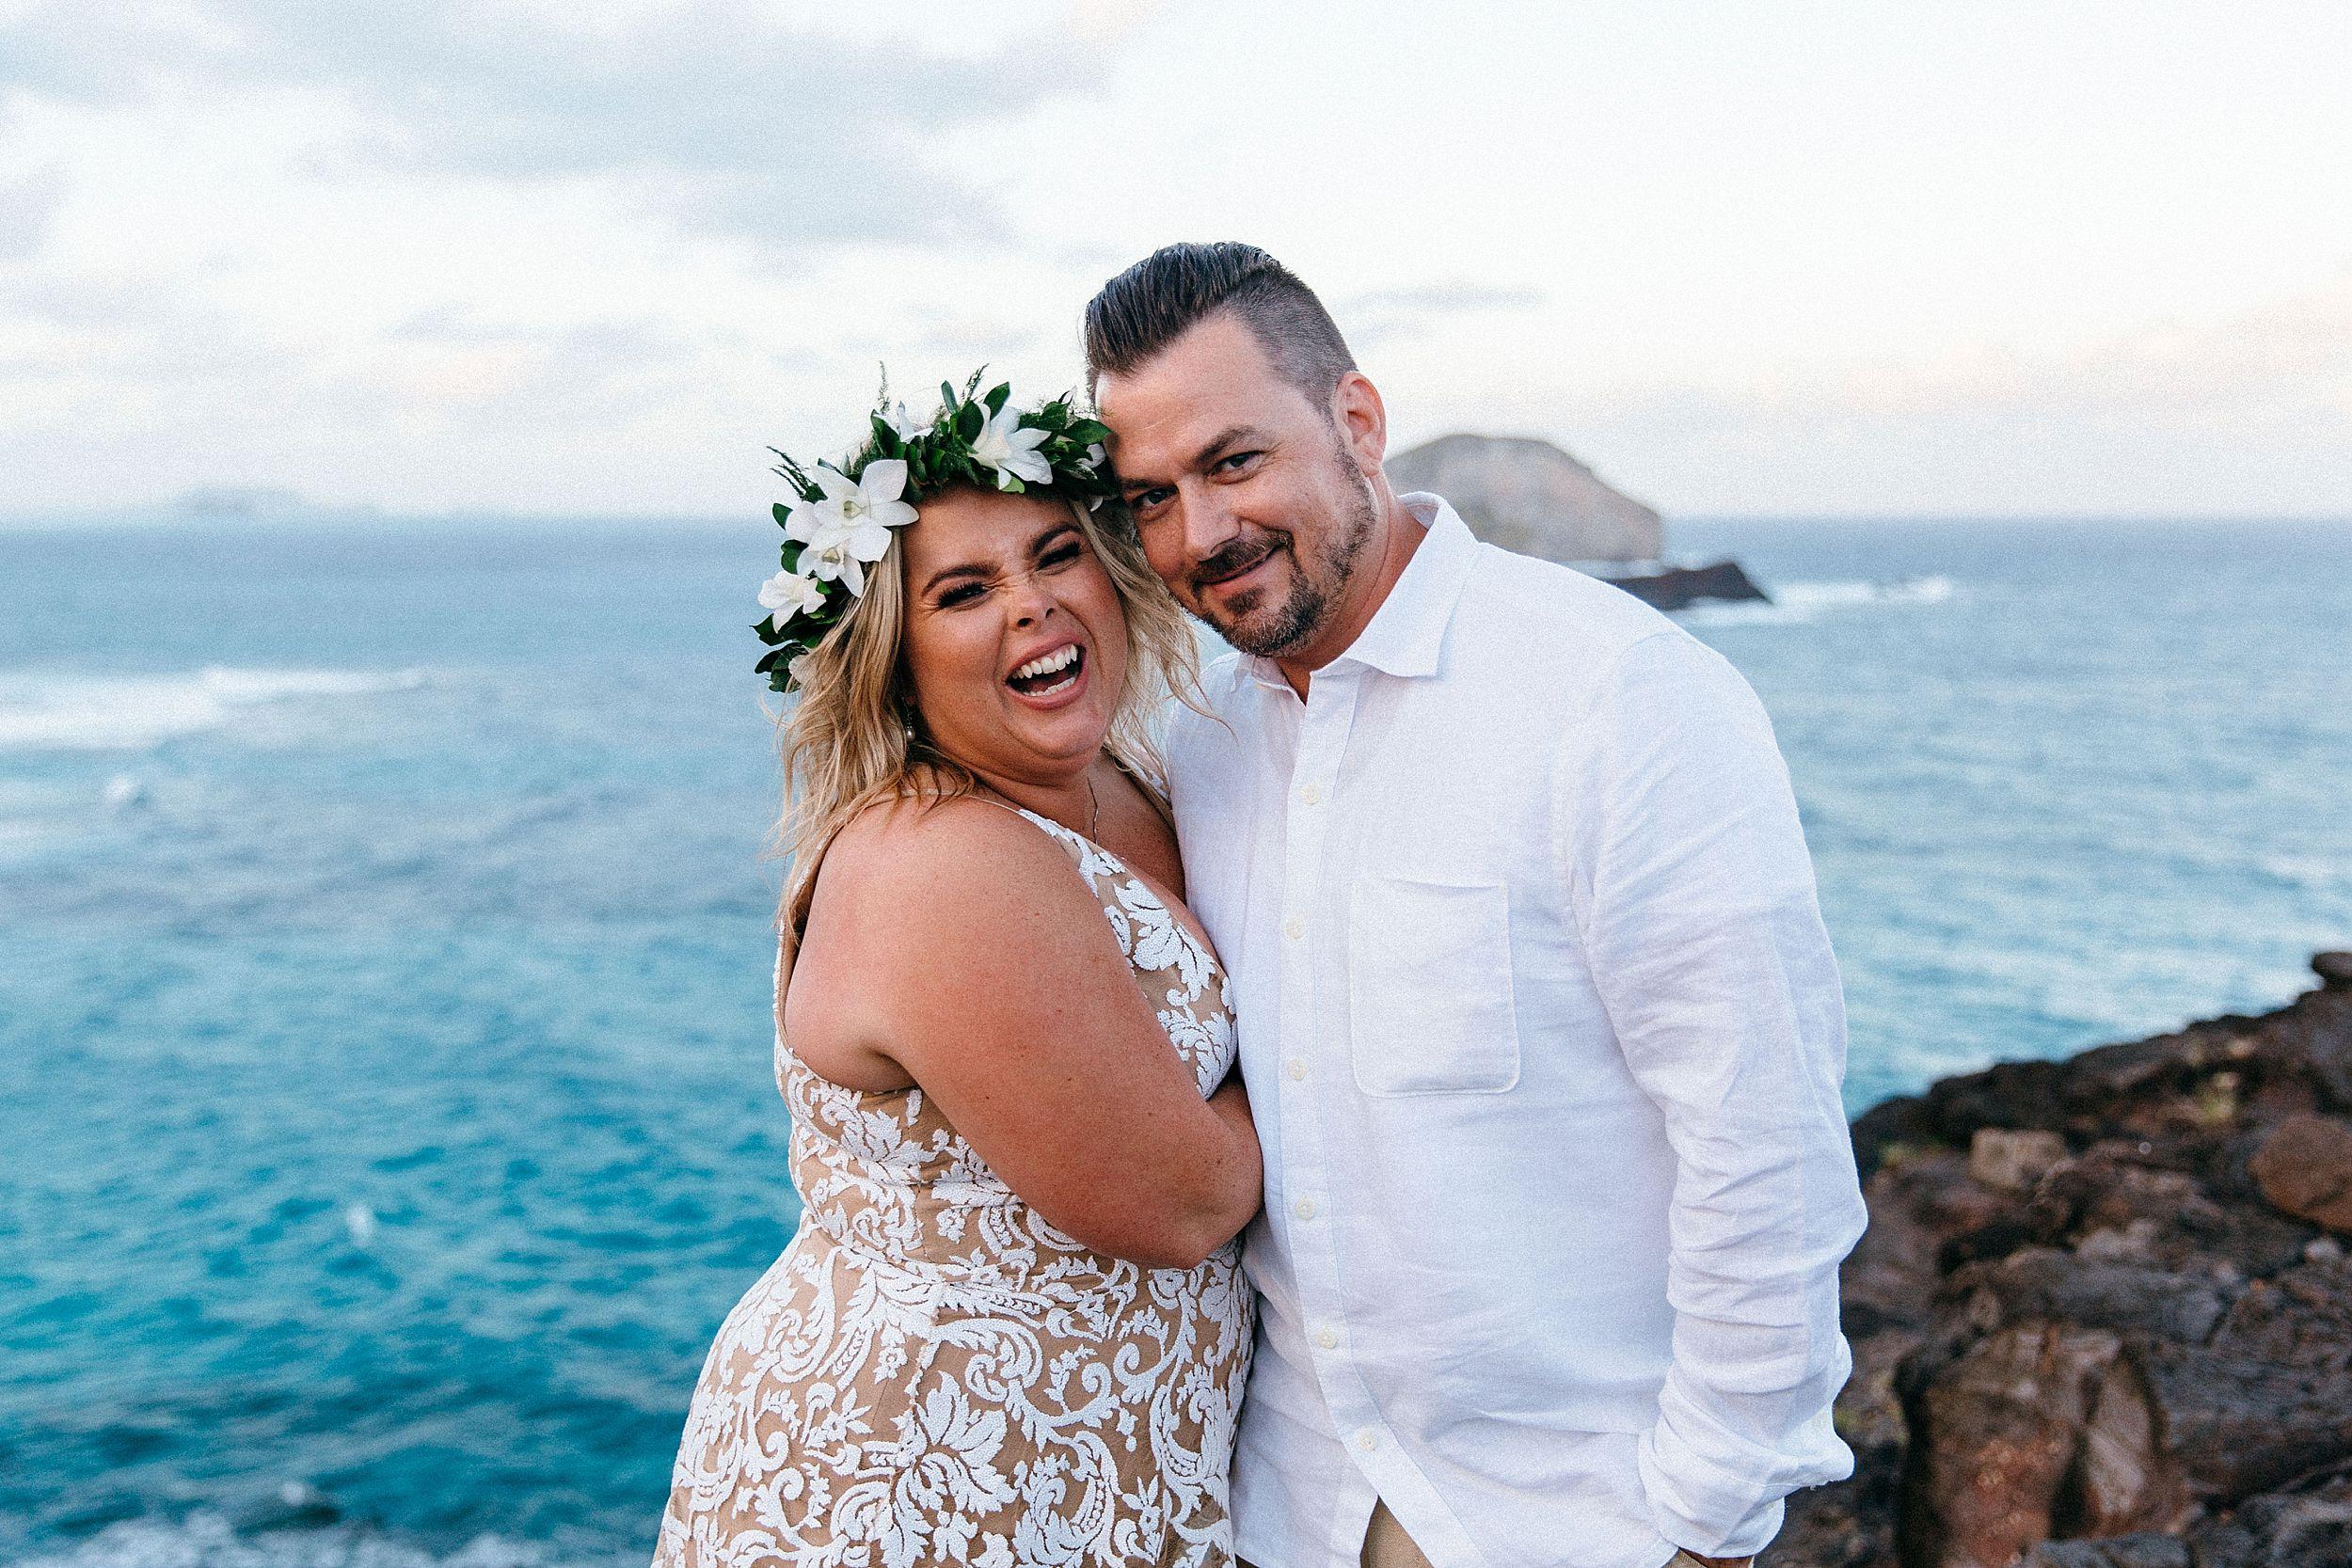 Wedding portraits at Makapuu Lighthouse and Lanai Lookout